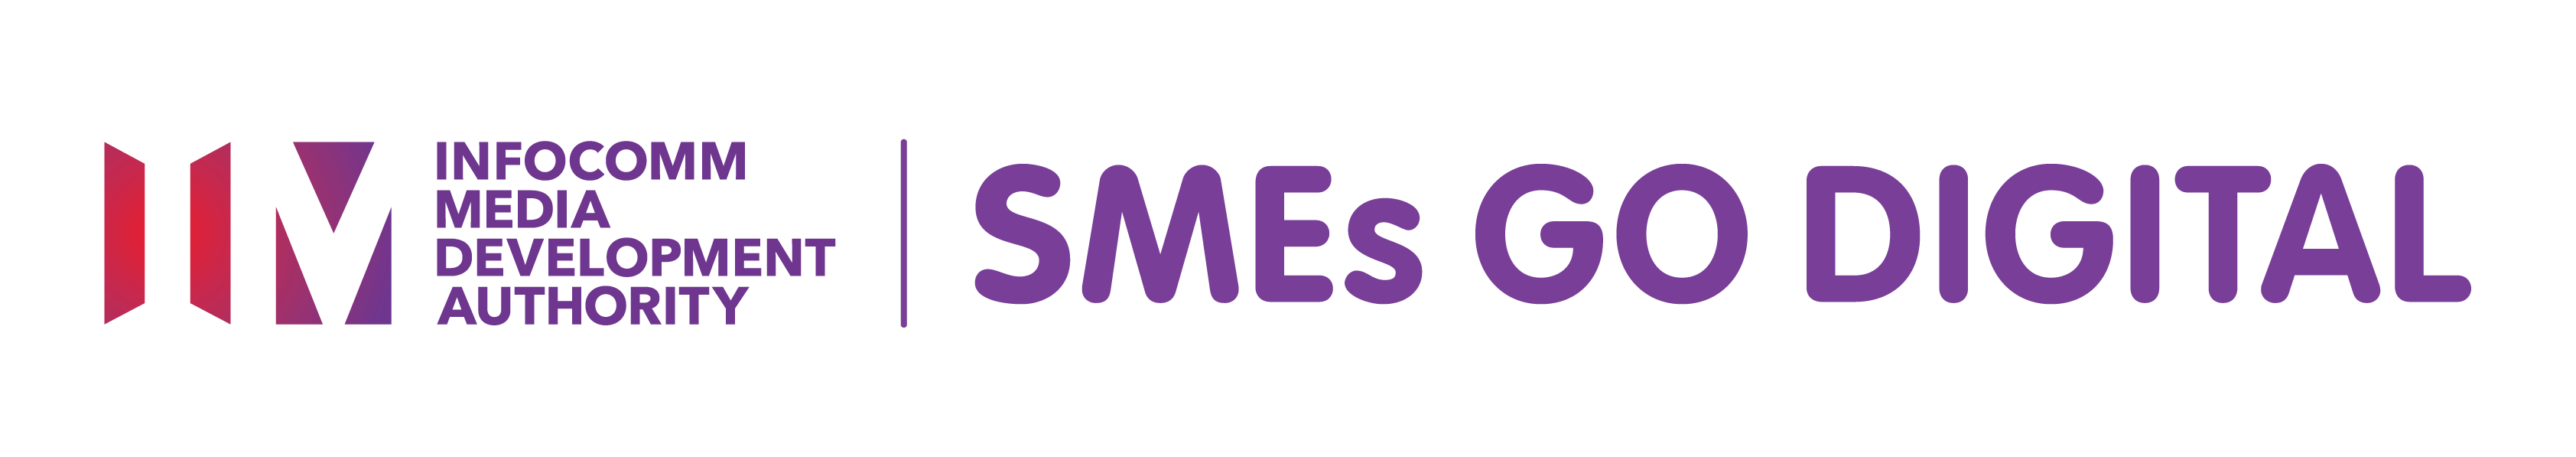 IMDA SMEs Go Digital